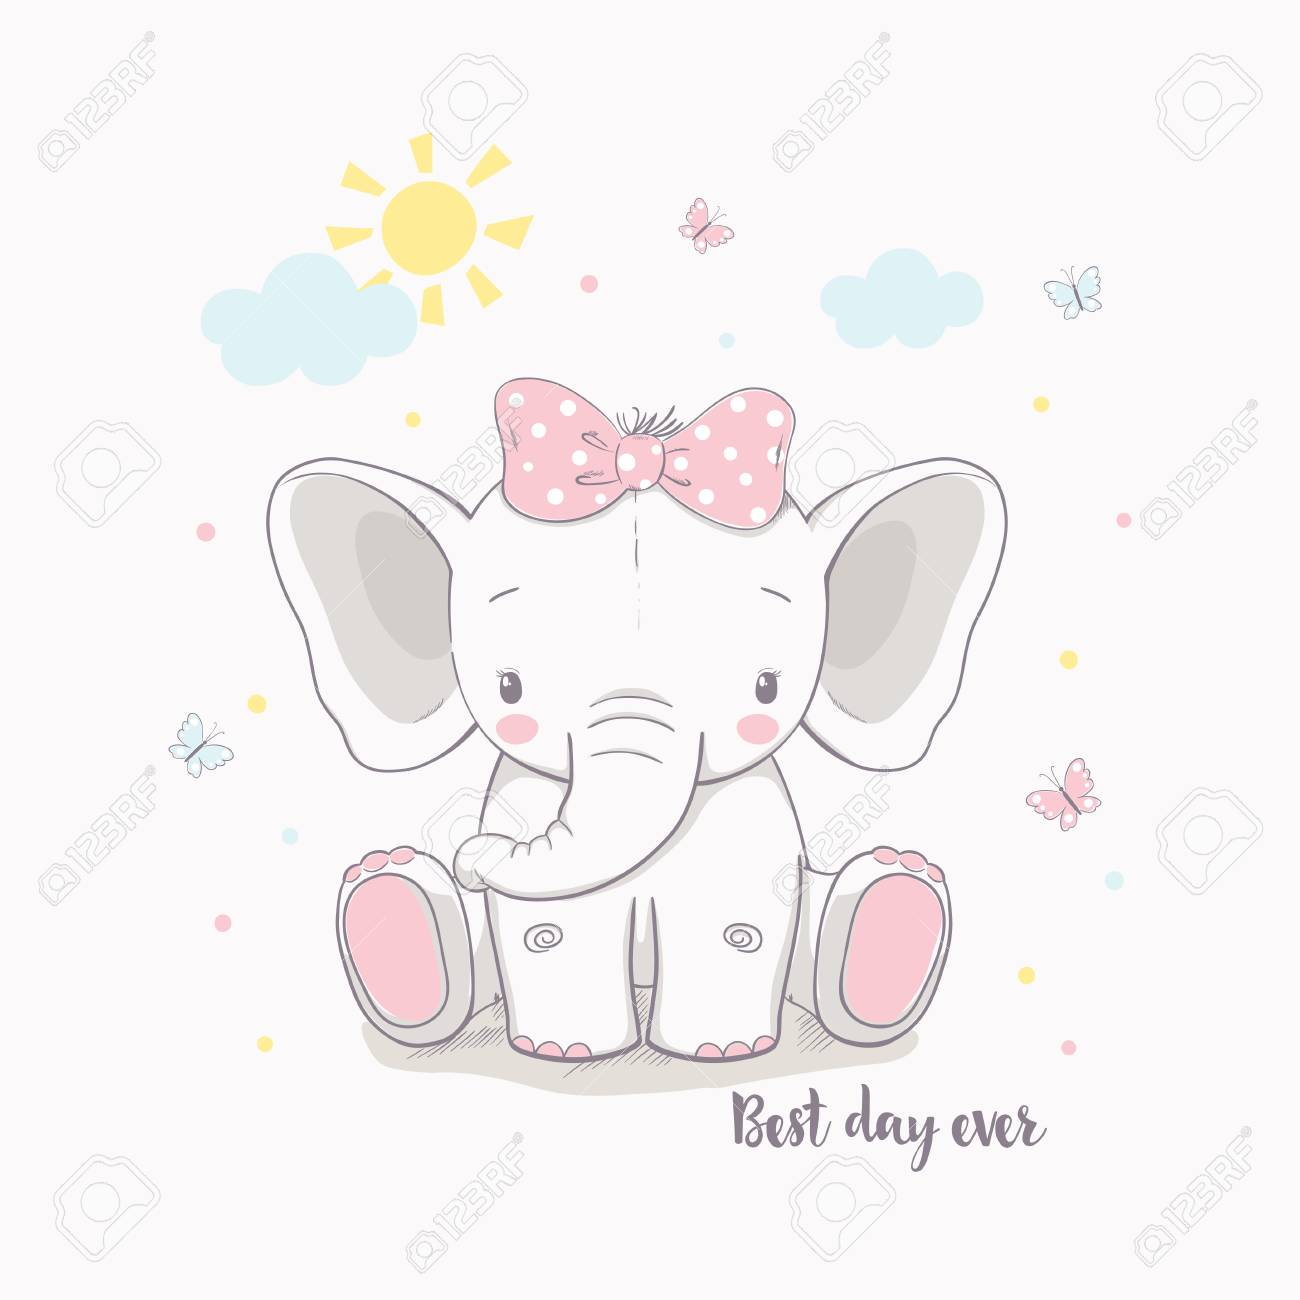 Little elephant girl. Vector illustration for kids. Use for print design, surface design, fashion kids wear, baby shower - 97386640